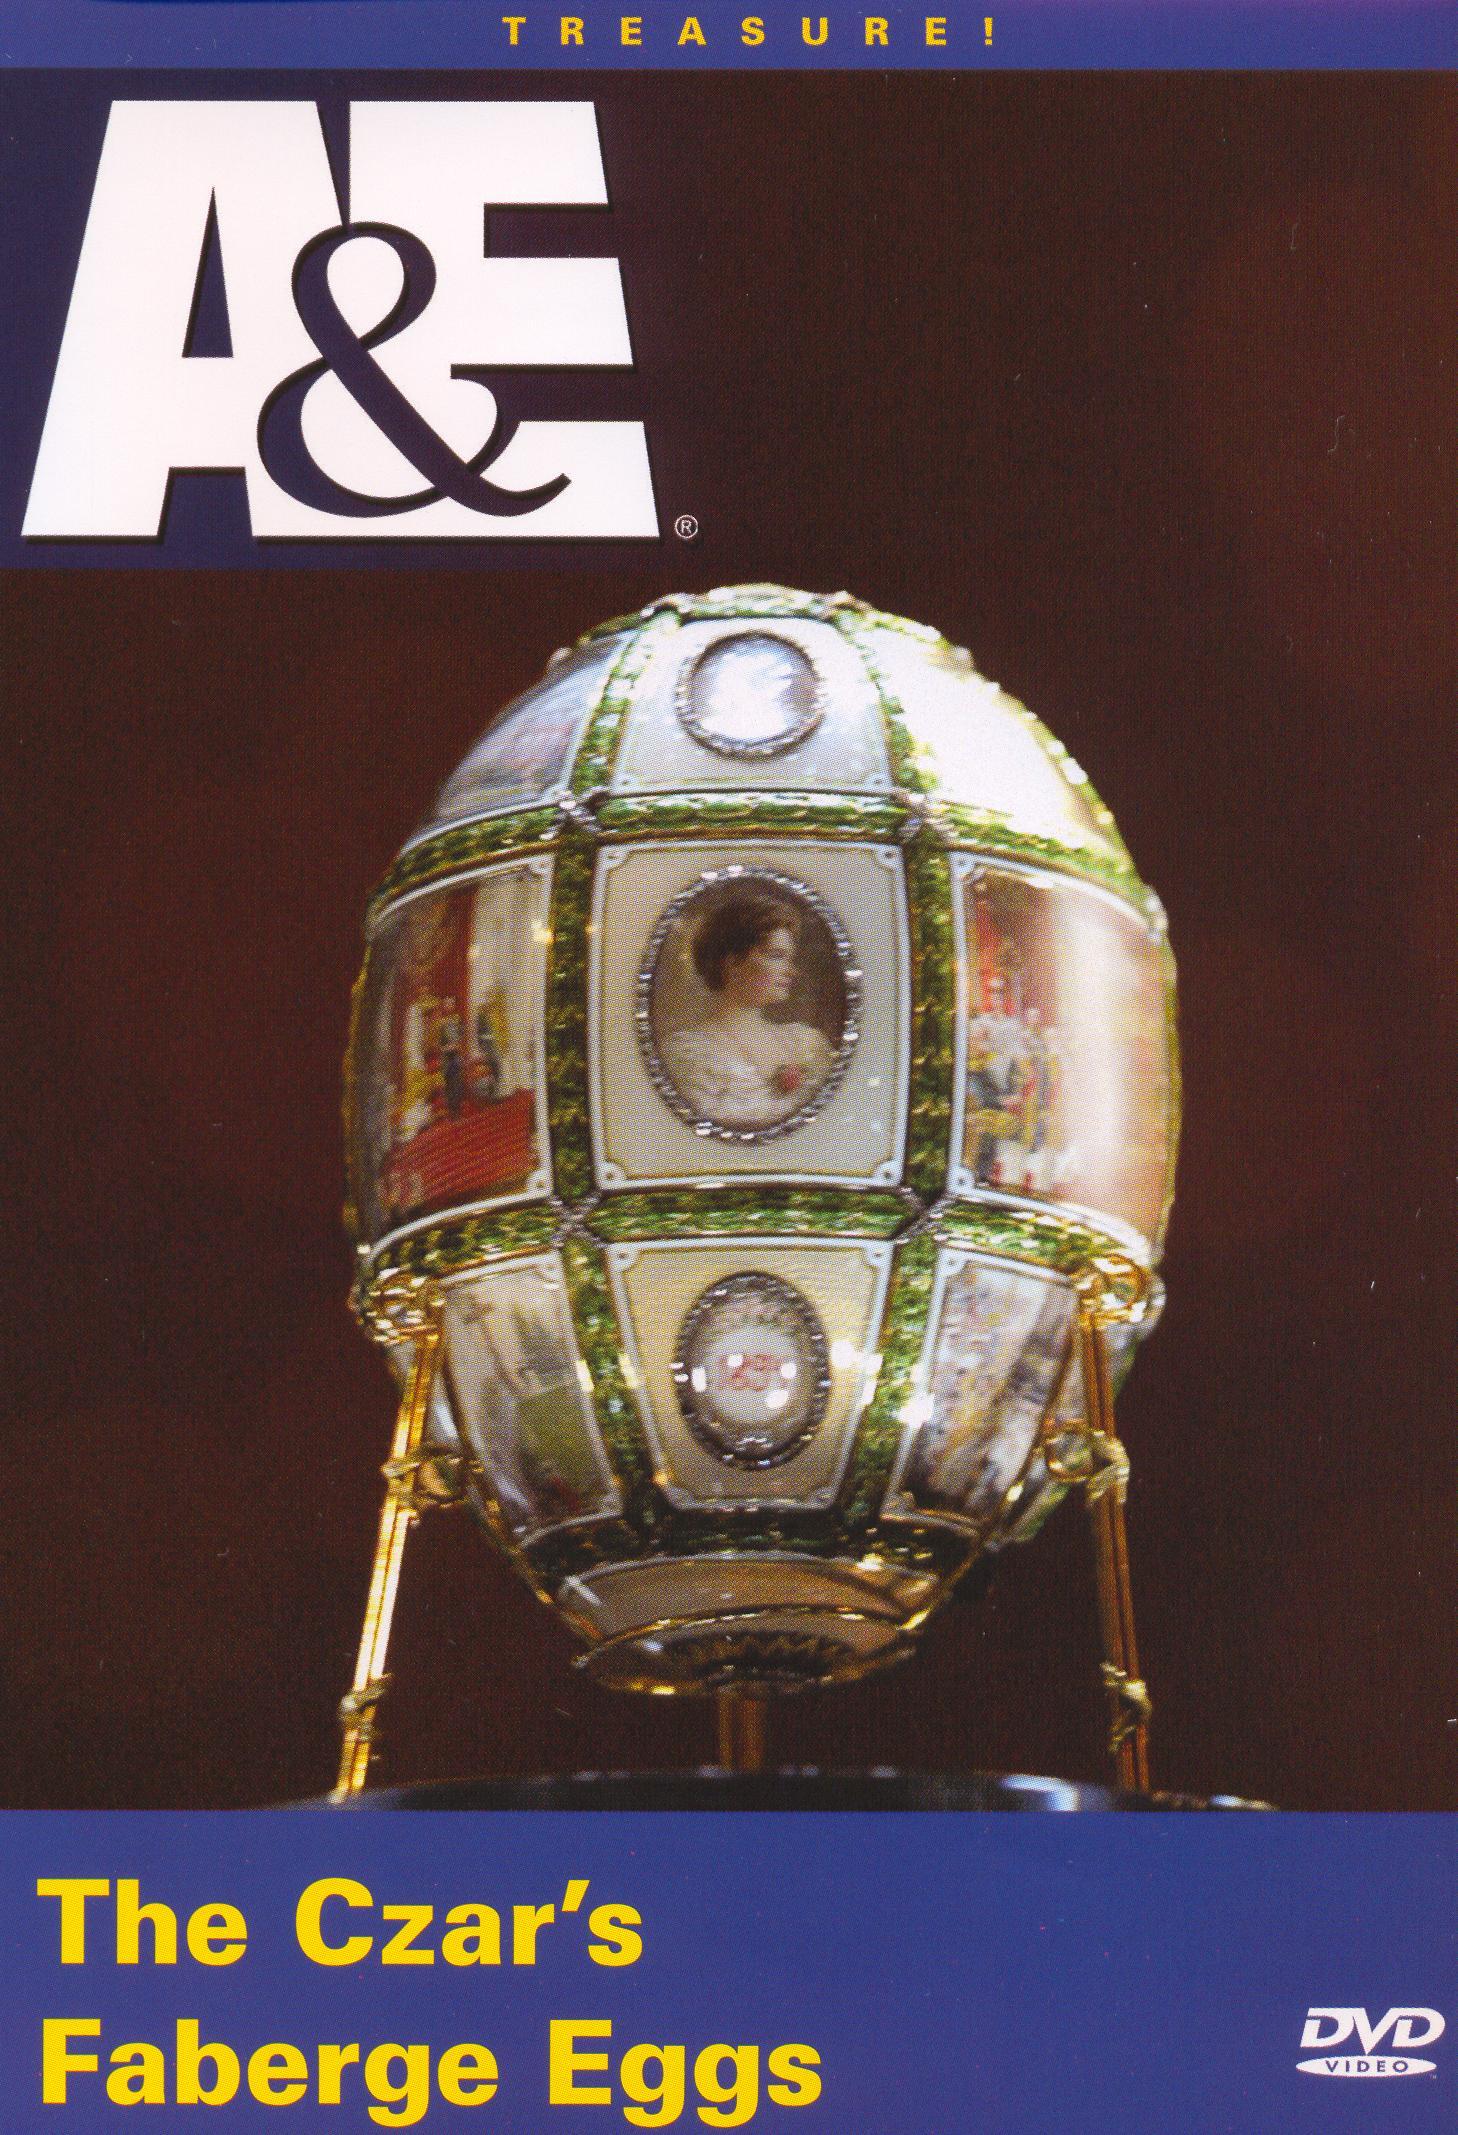 Treasure! The Czar's Faberge Eggs